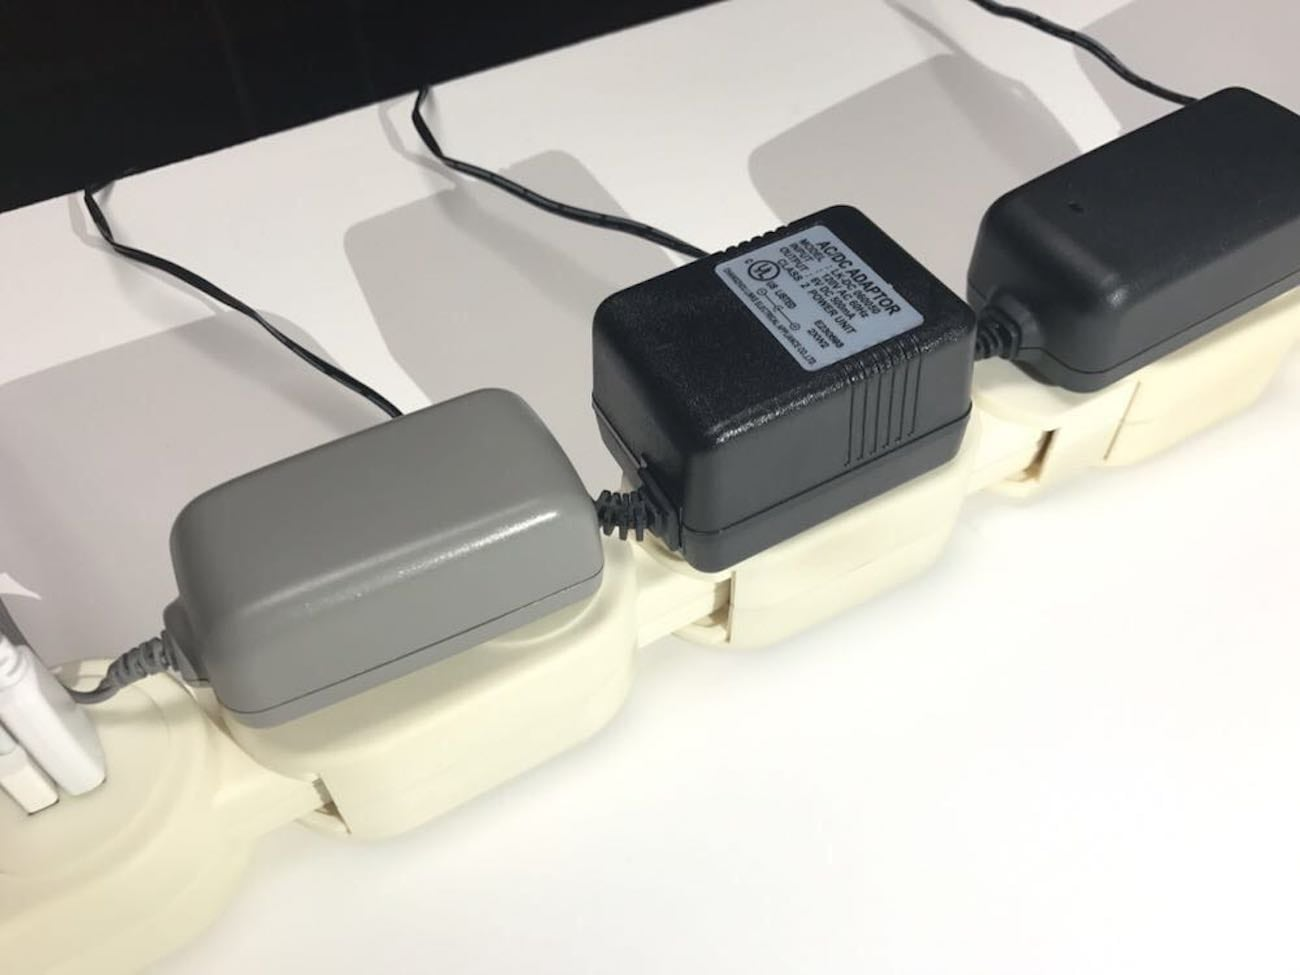 FLEXPAND POWER Flexible Electric Extension